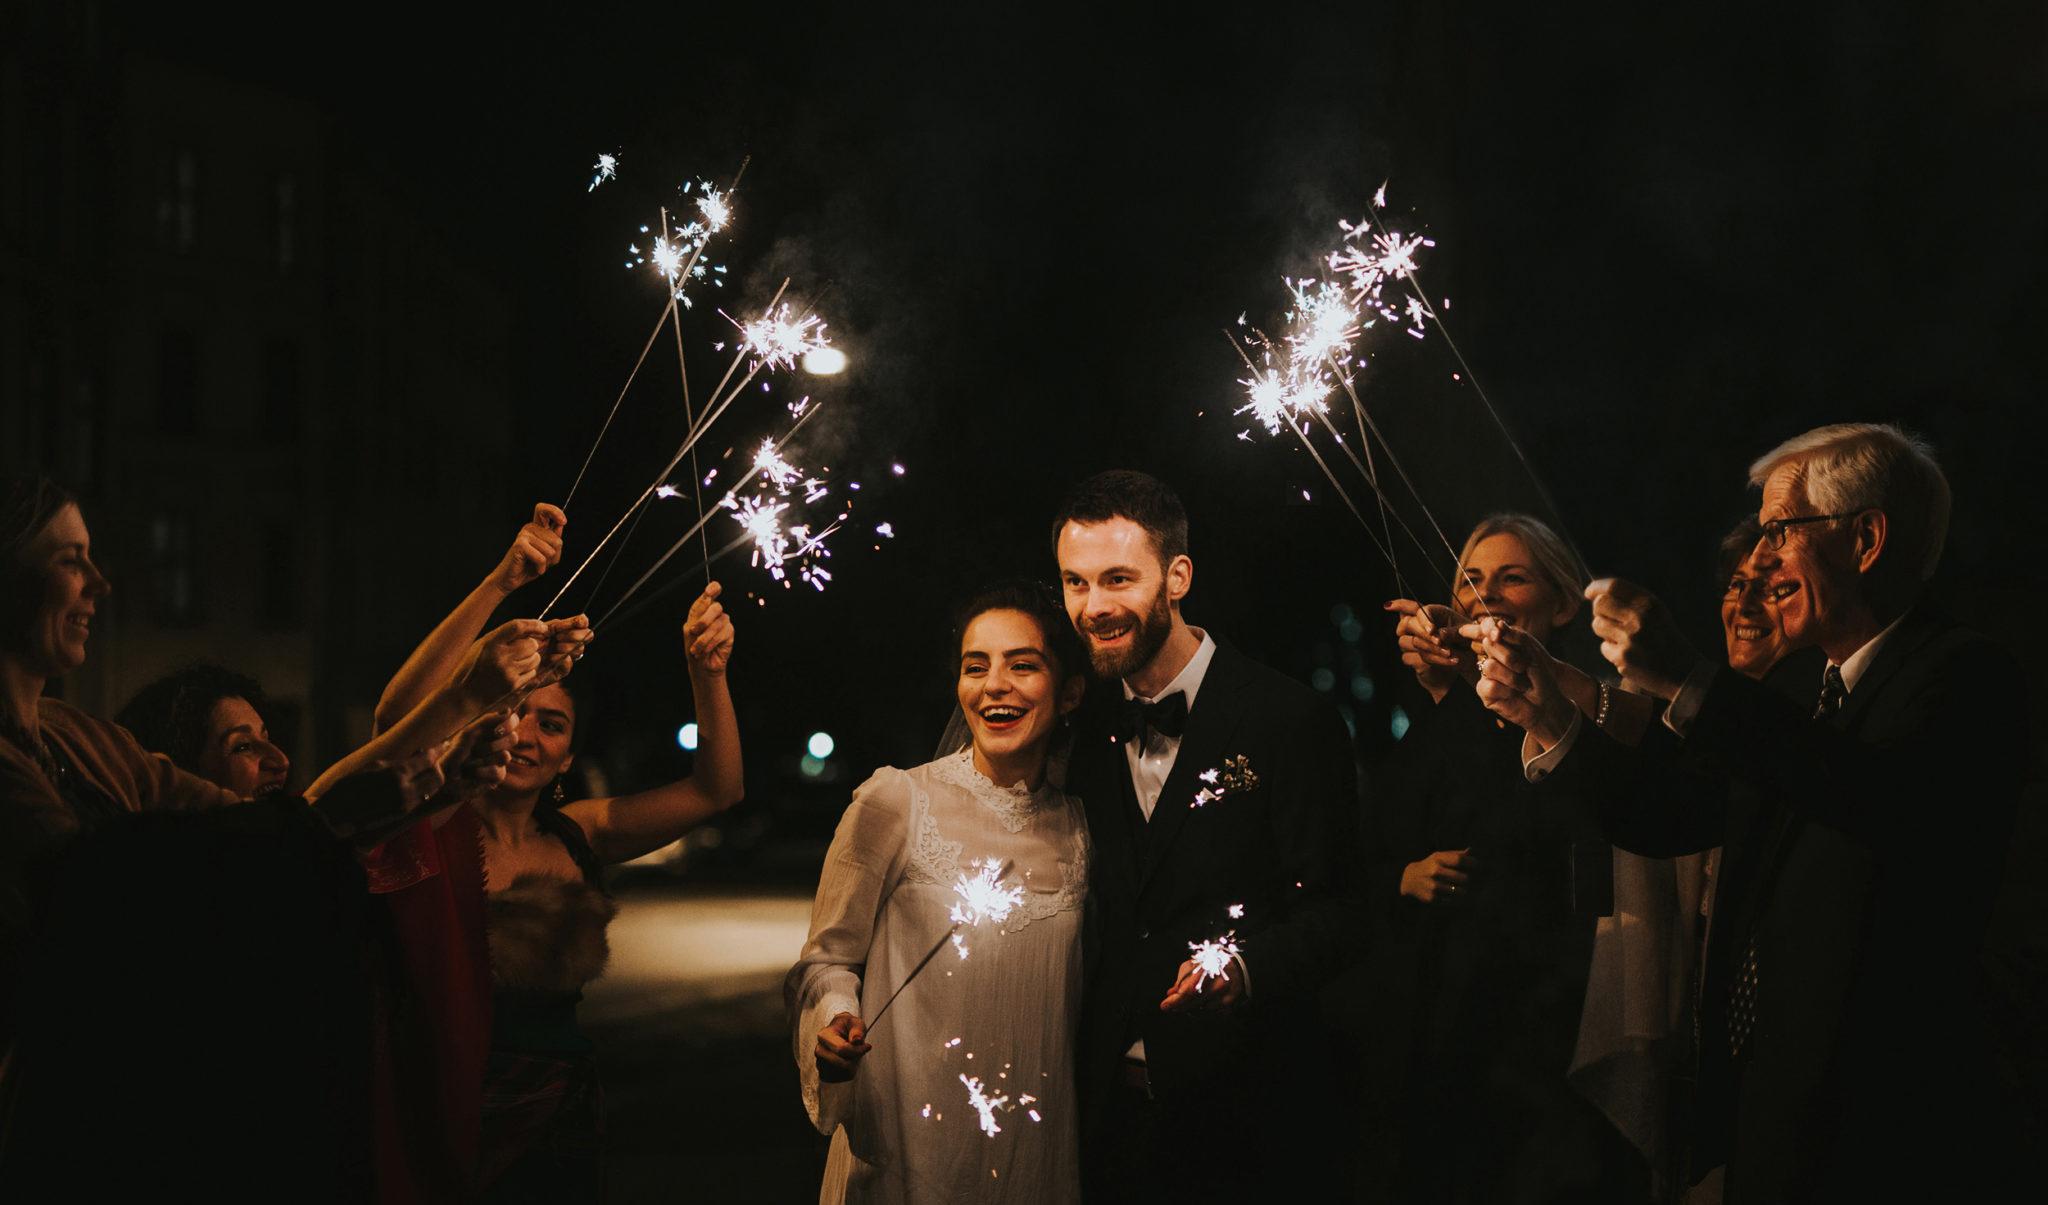 stjerneskudd bryllup dokumentarisk bryllupsfotograf i norge